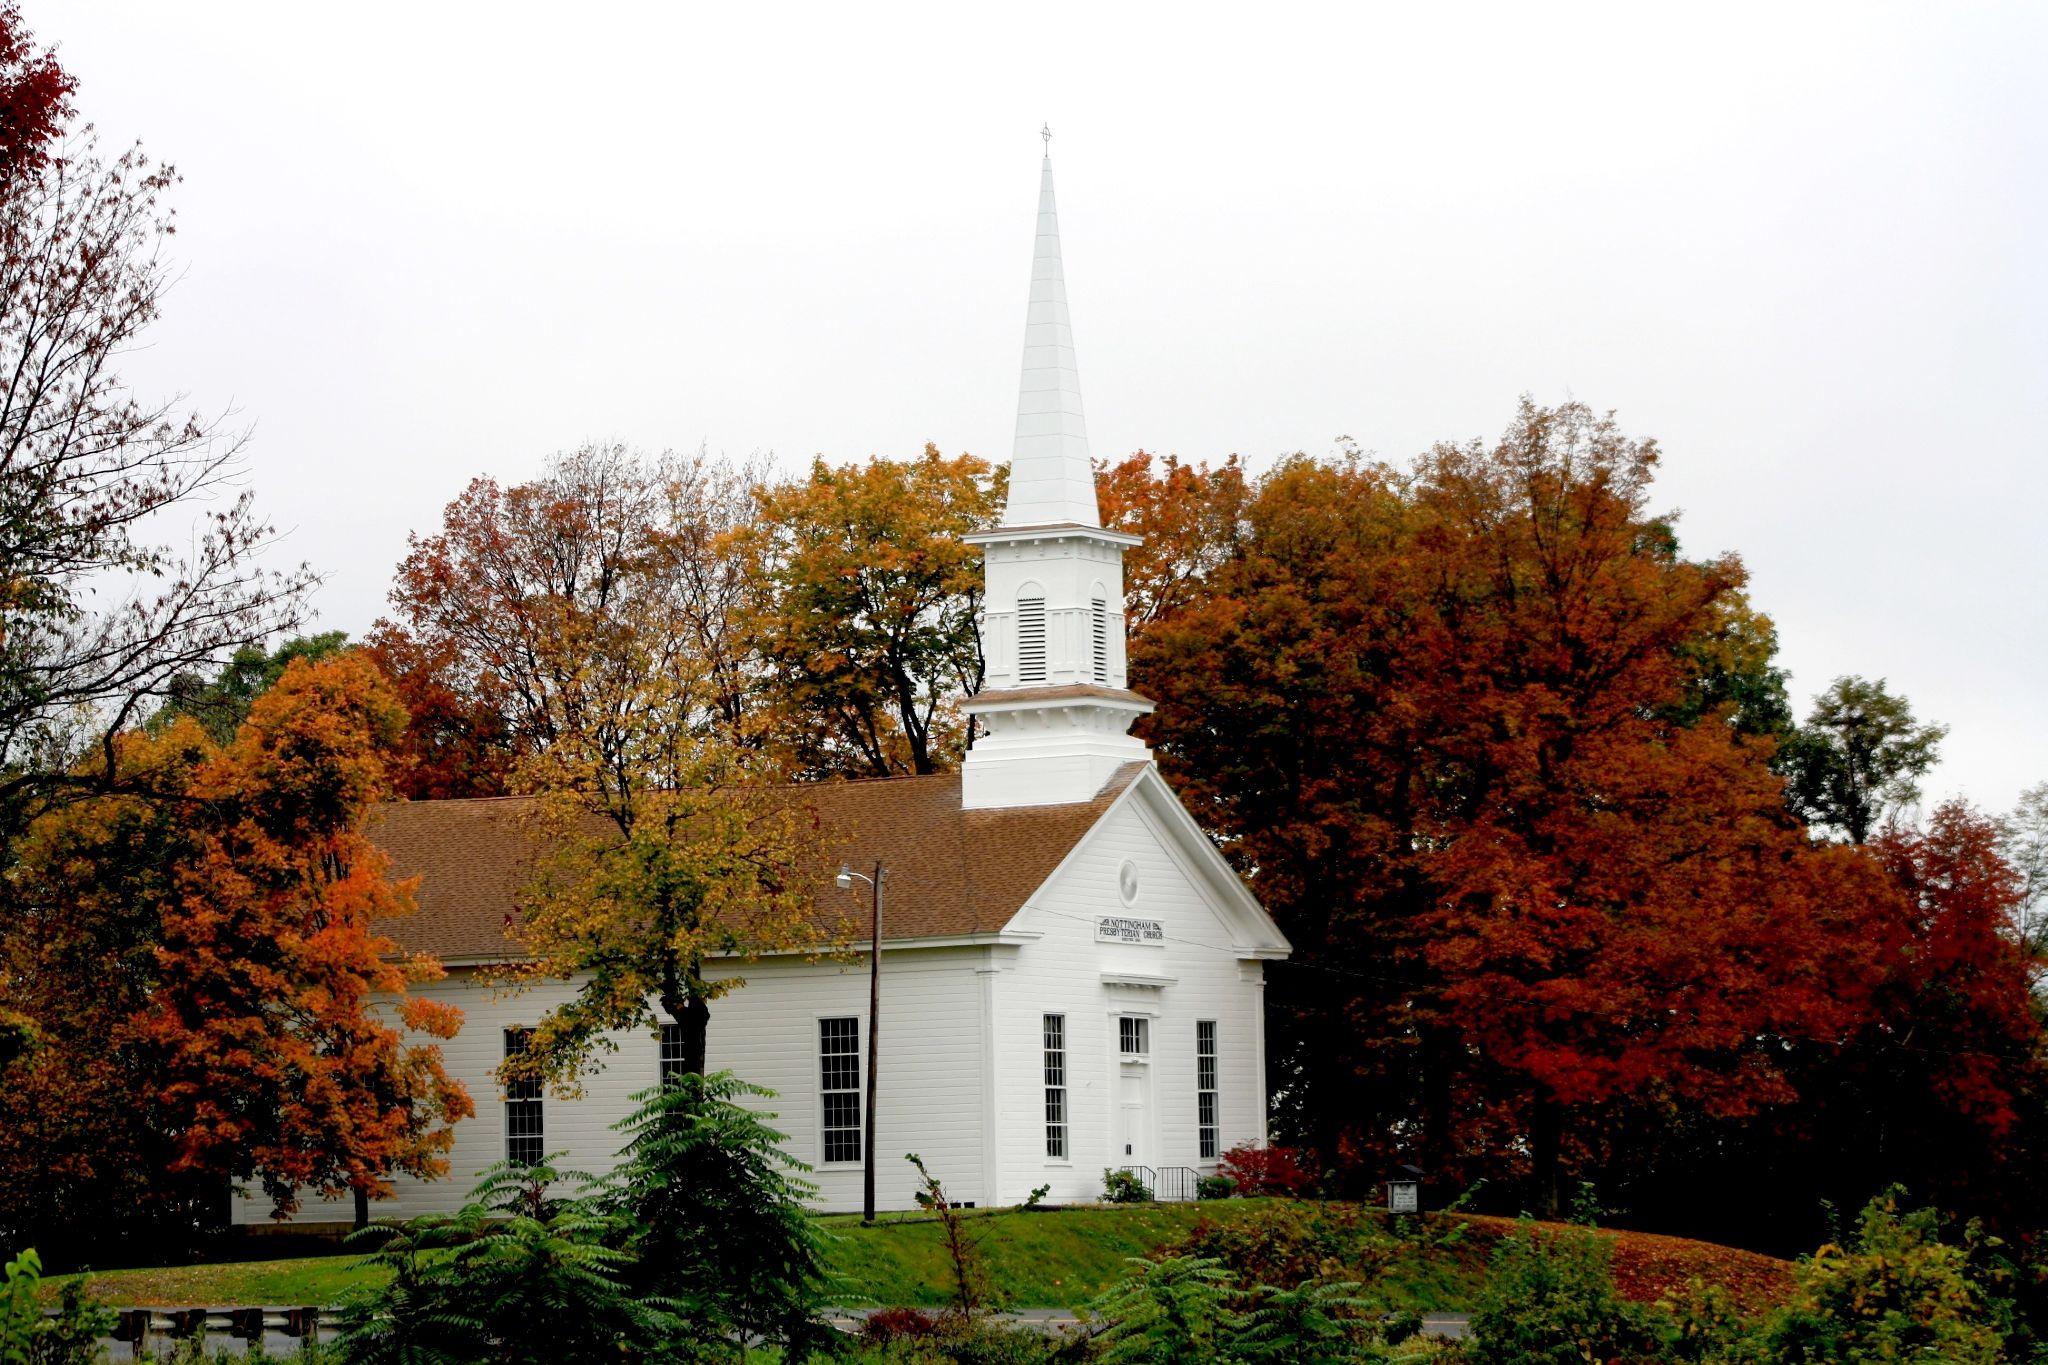 Country Church by DeniseCrawford